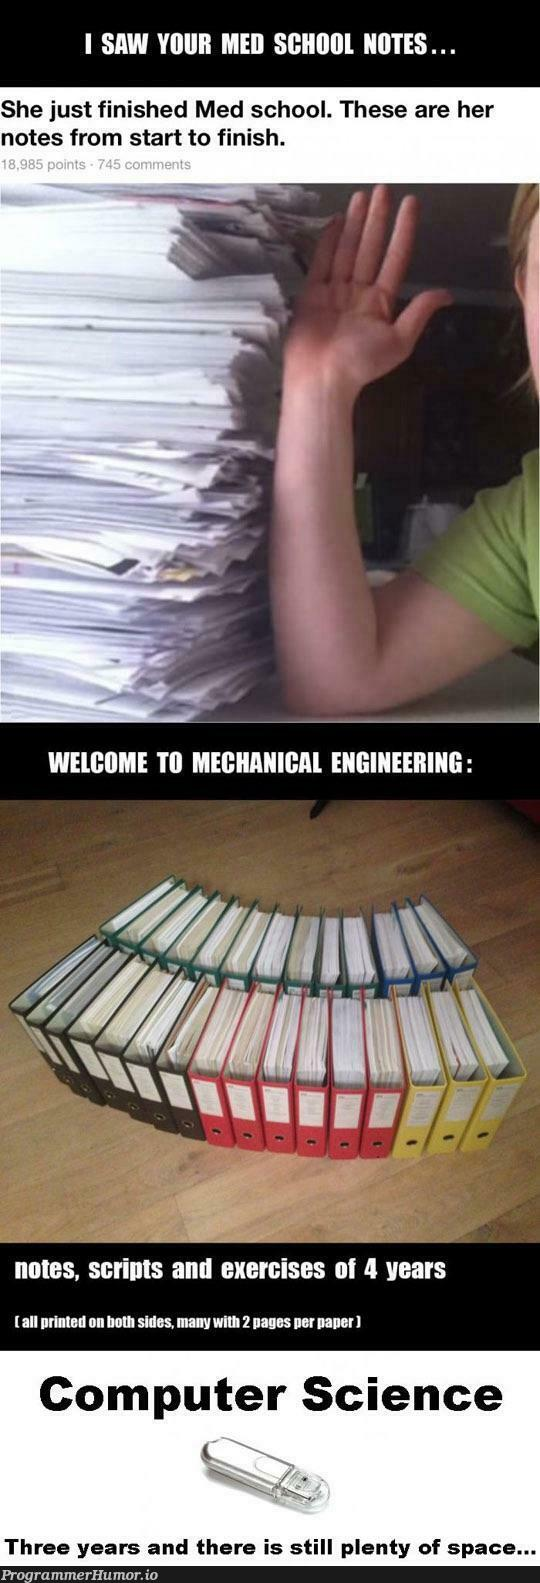 College notes war | computer-memes, computer science-memes, engineer-memes, engineering-memes, ide-memes, bot-memes, space-memes | ProgrammerHumor.io